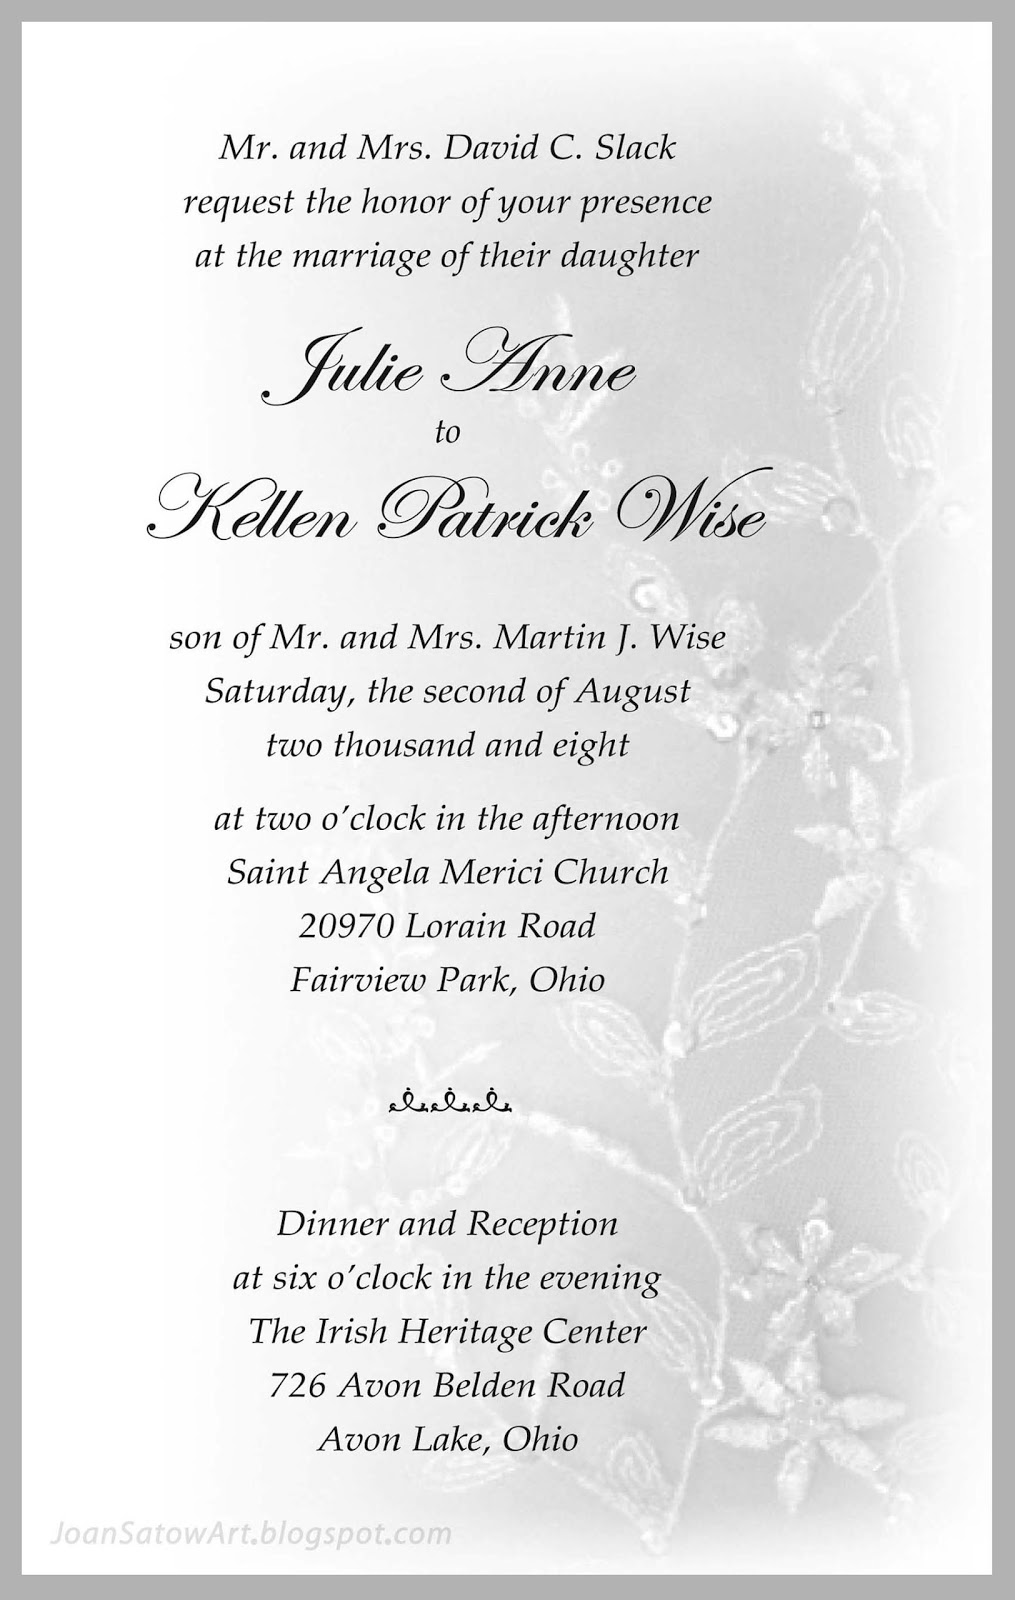 Joan Satow: Special Occasion Graphics • Invites • Etc